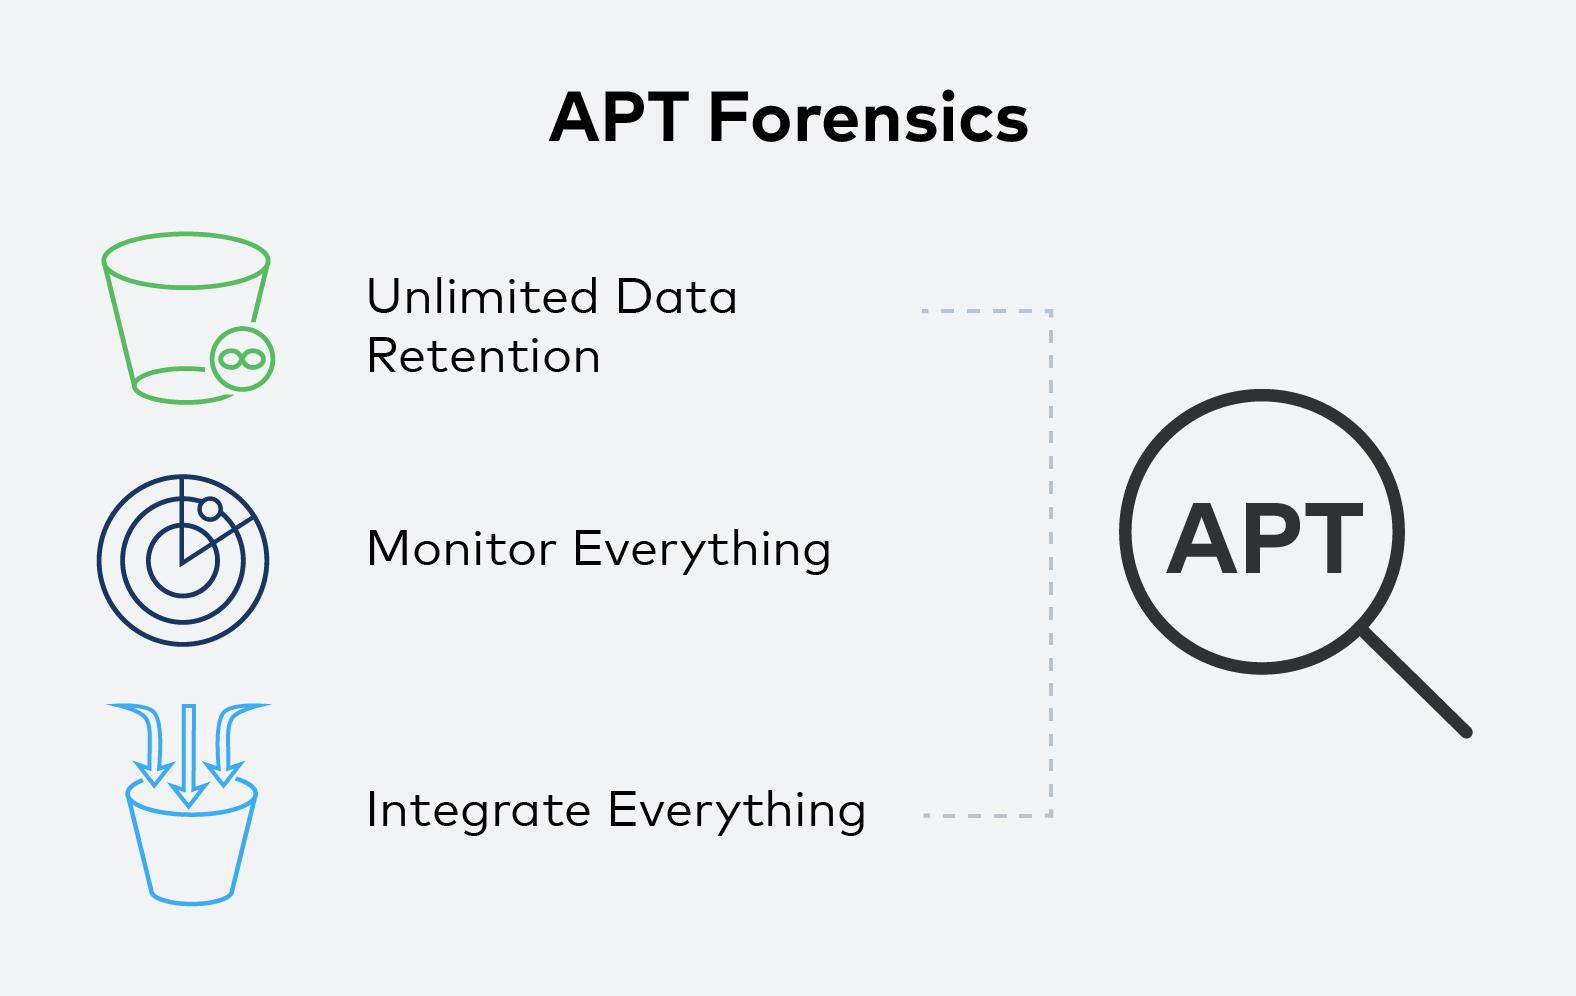 APT-Forensics